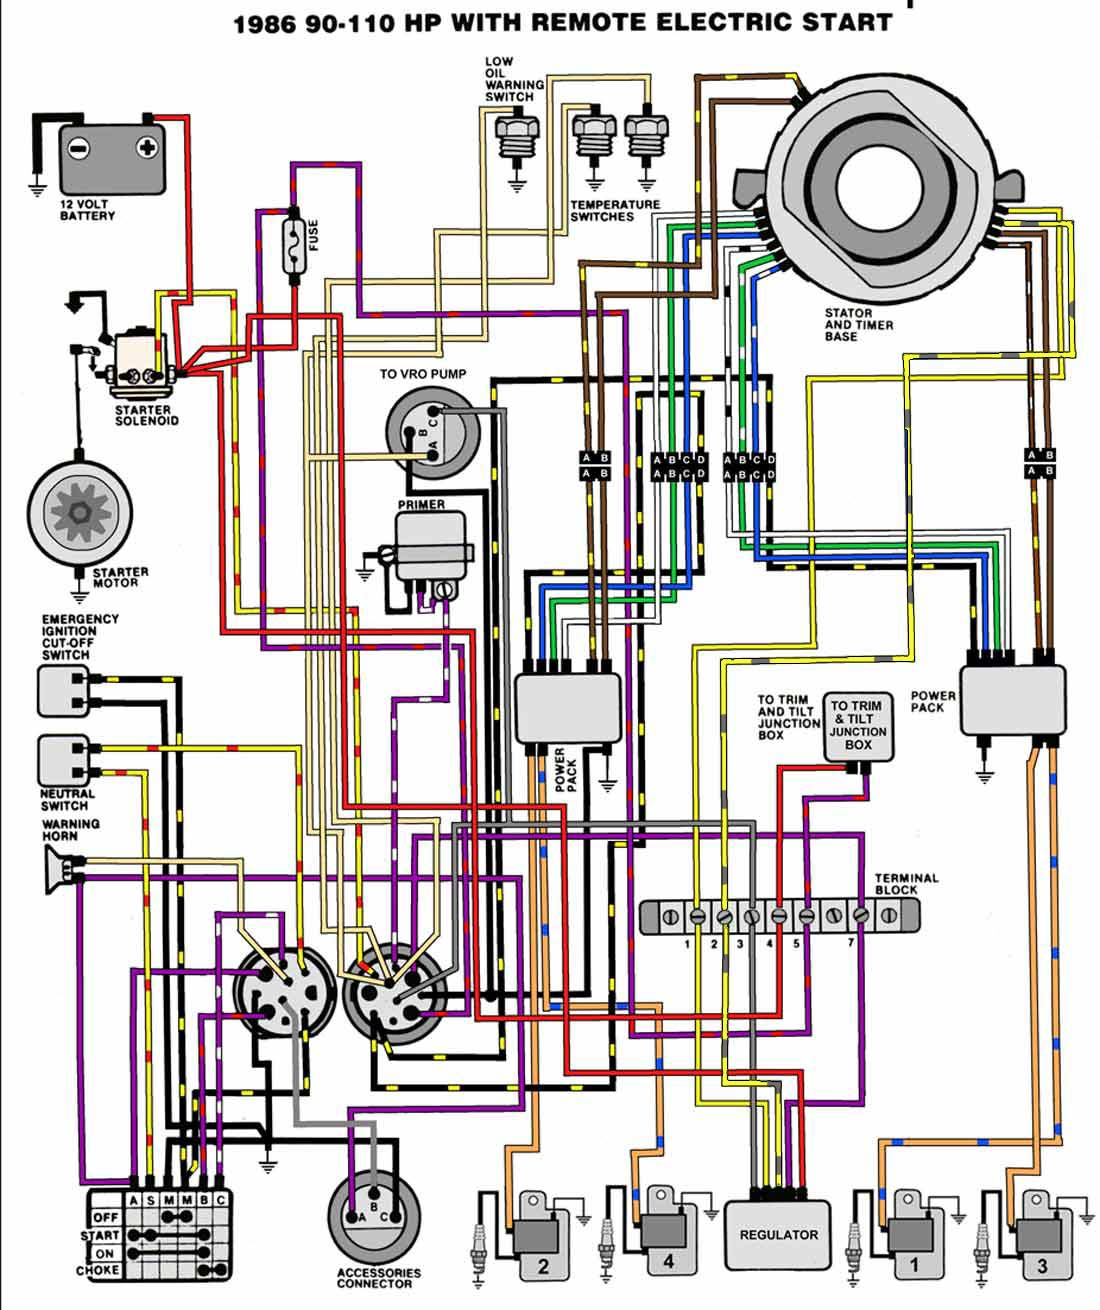 1986_90_115?resize\\\=618%2C736 90 hp evinrude wiring diagram wiring diagram pictures \u2022